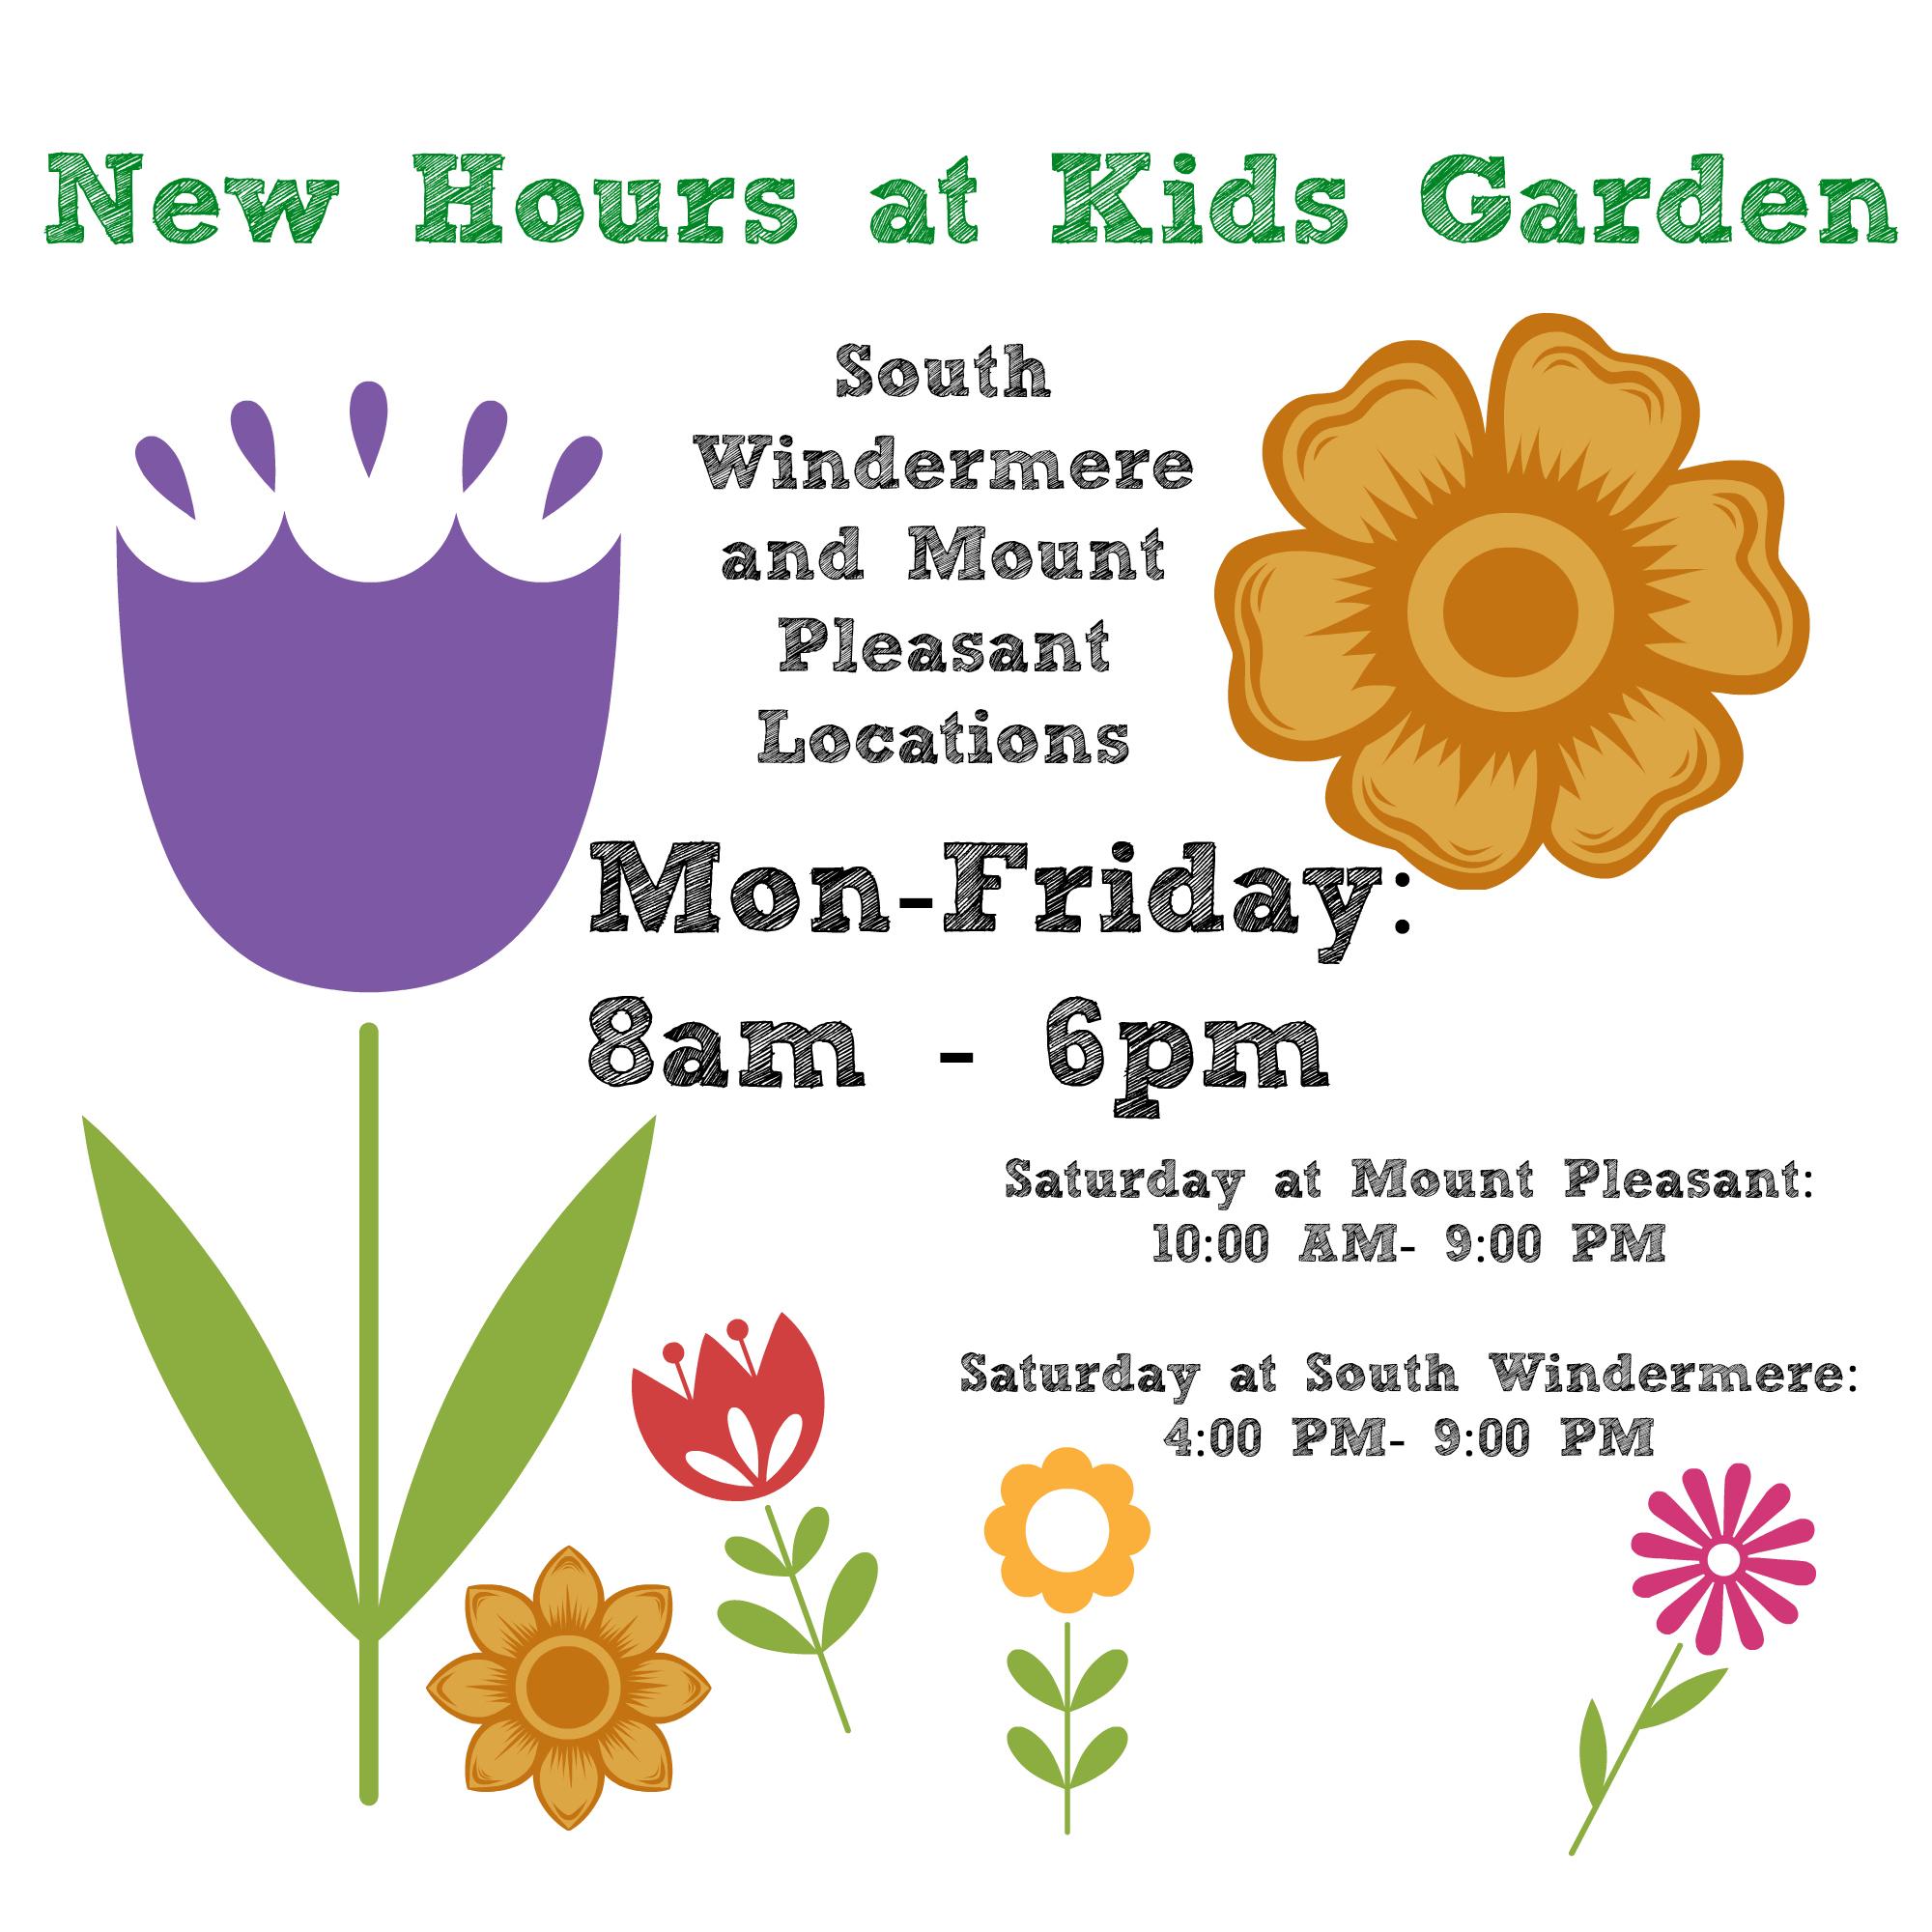 New Hours at Kids Garden